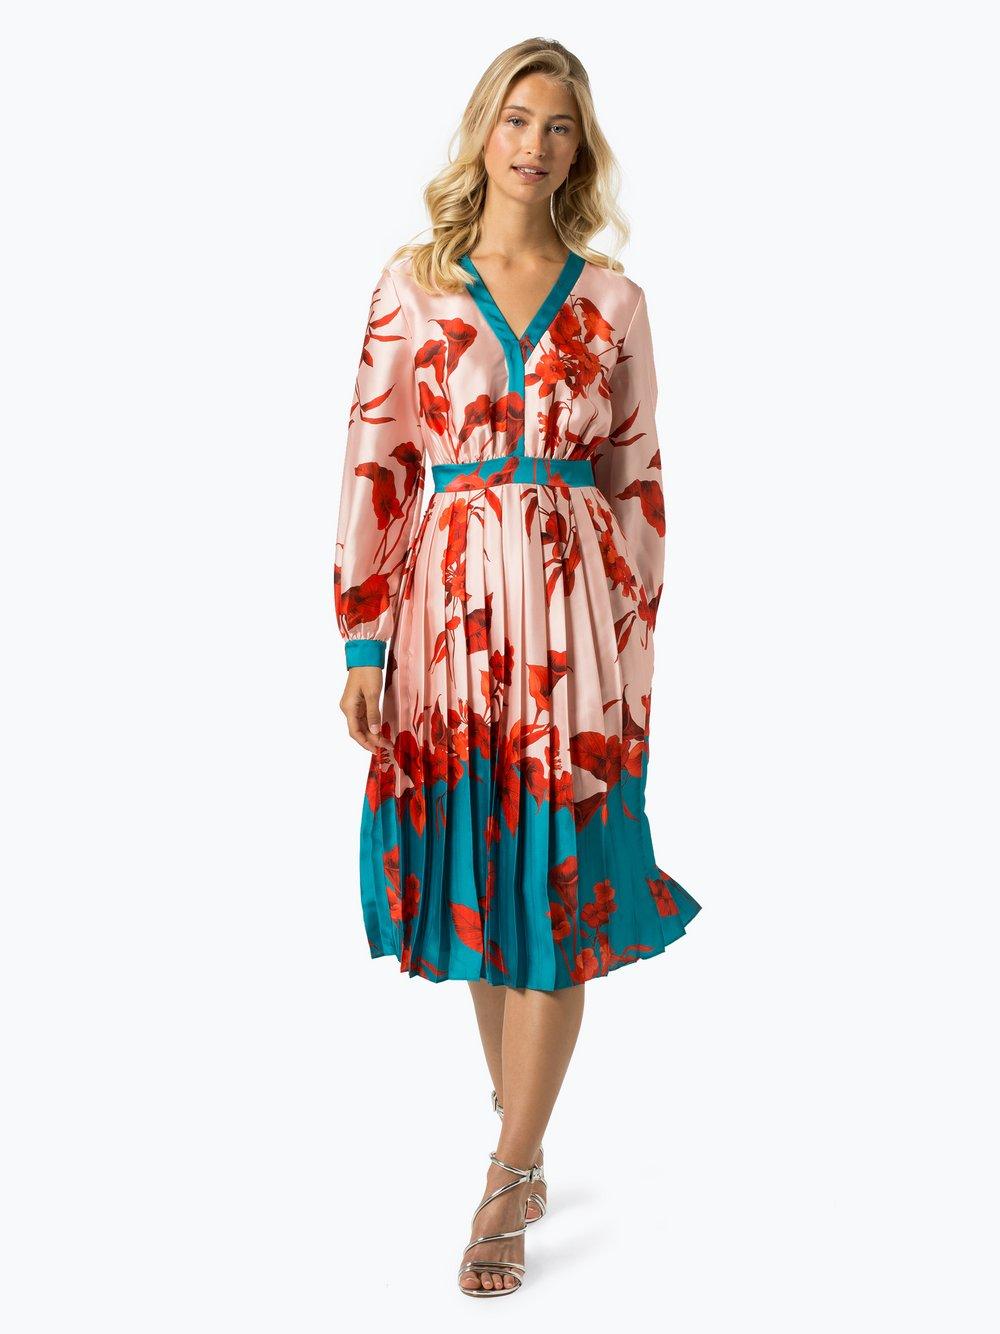 Ted Baker - Sukienka damska – Karolyn, różowy